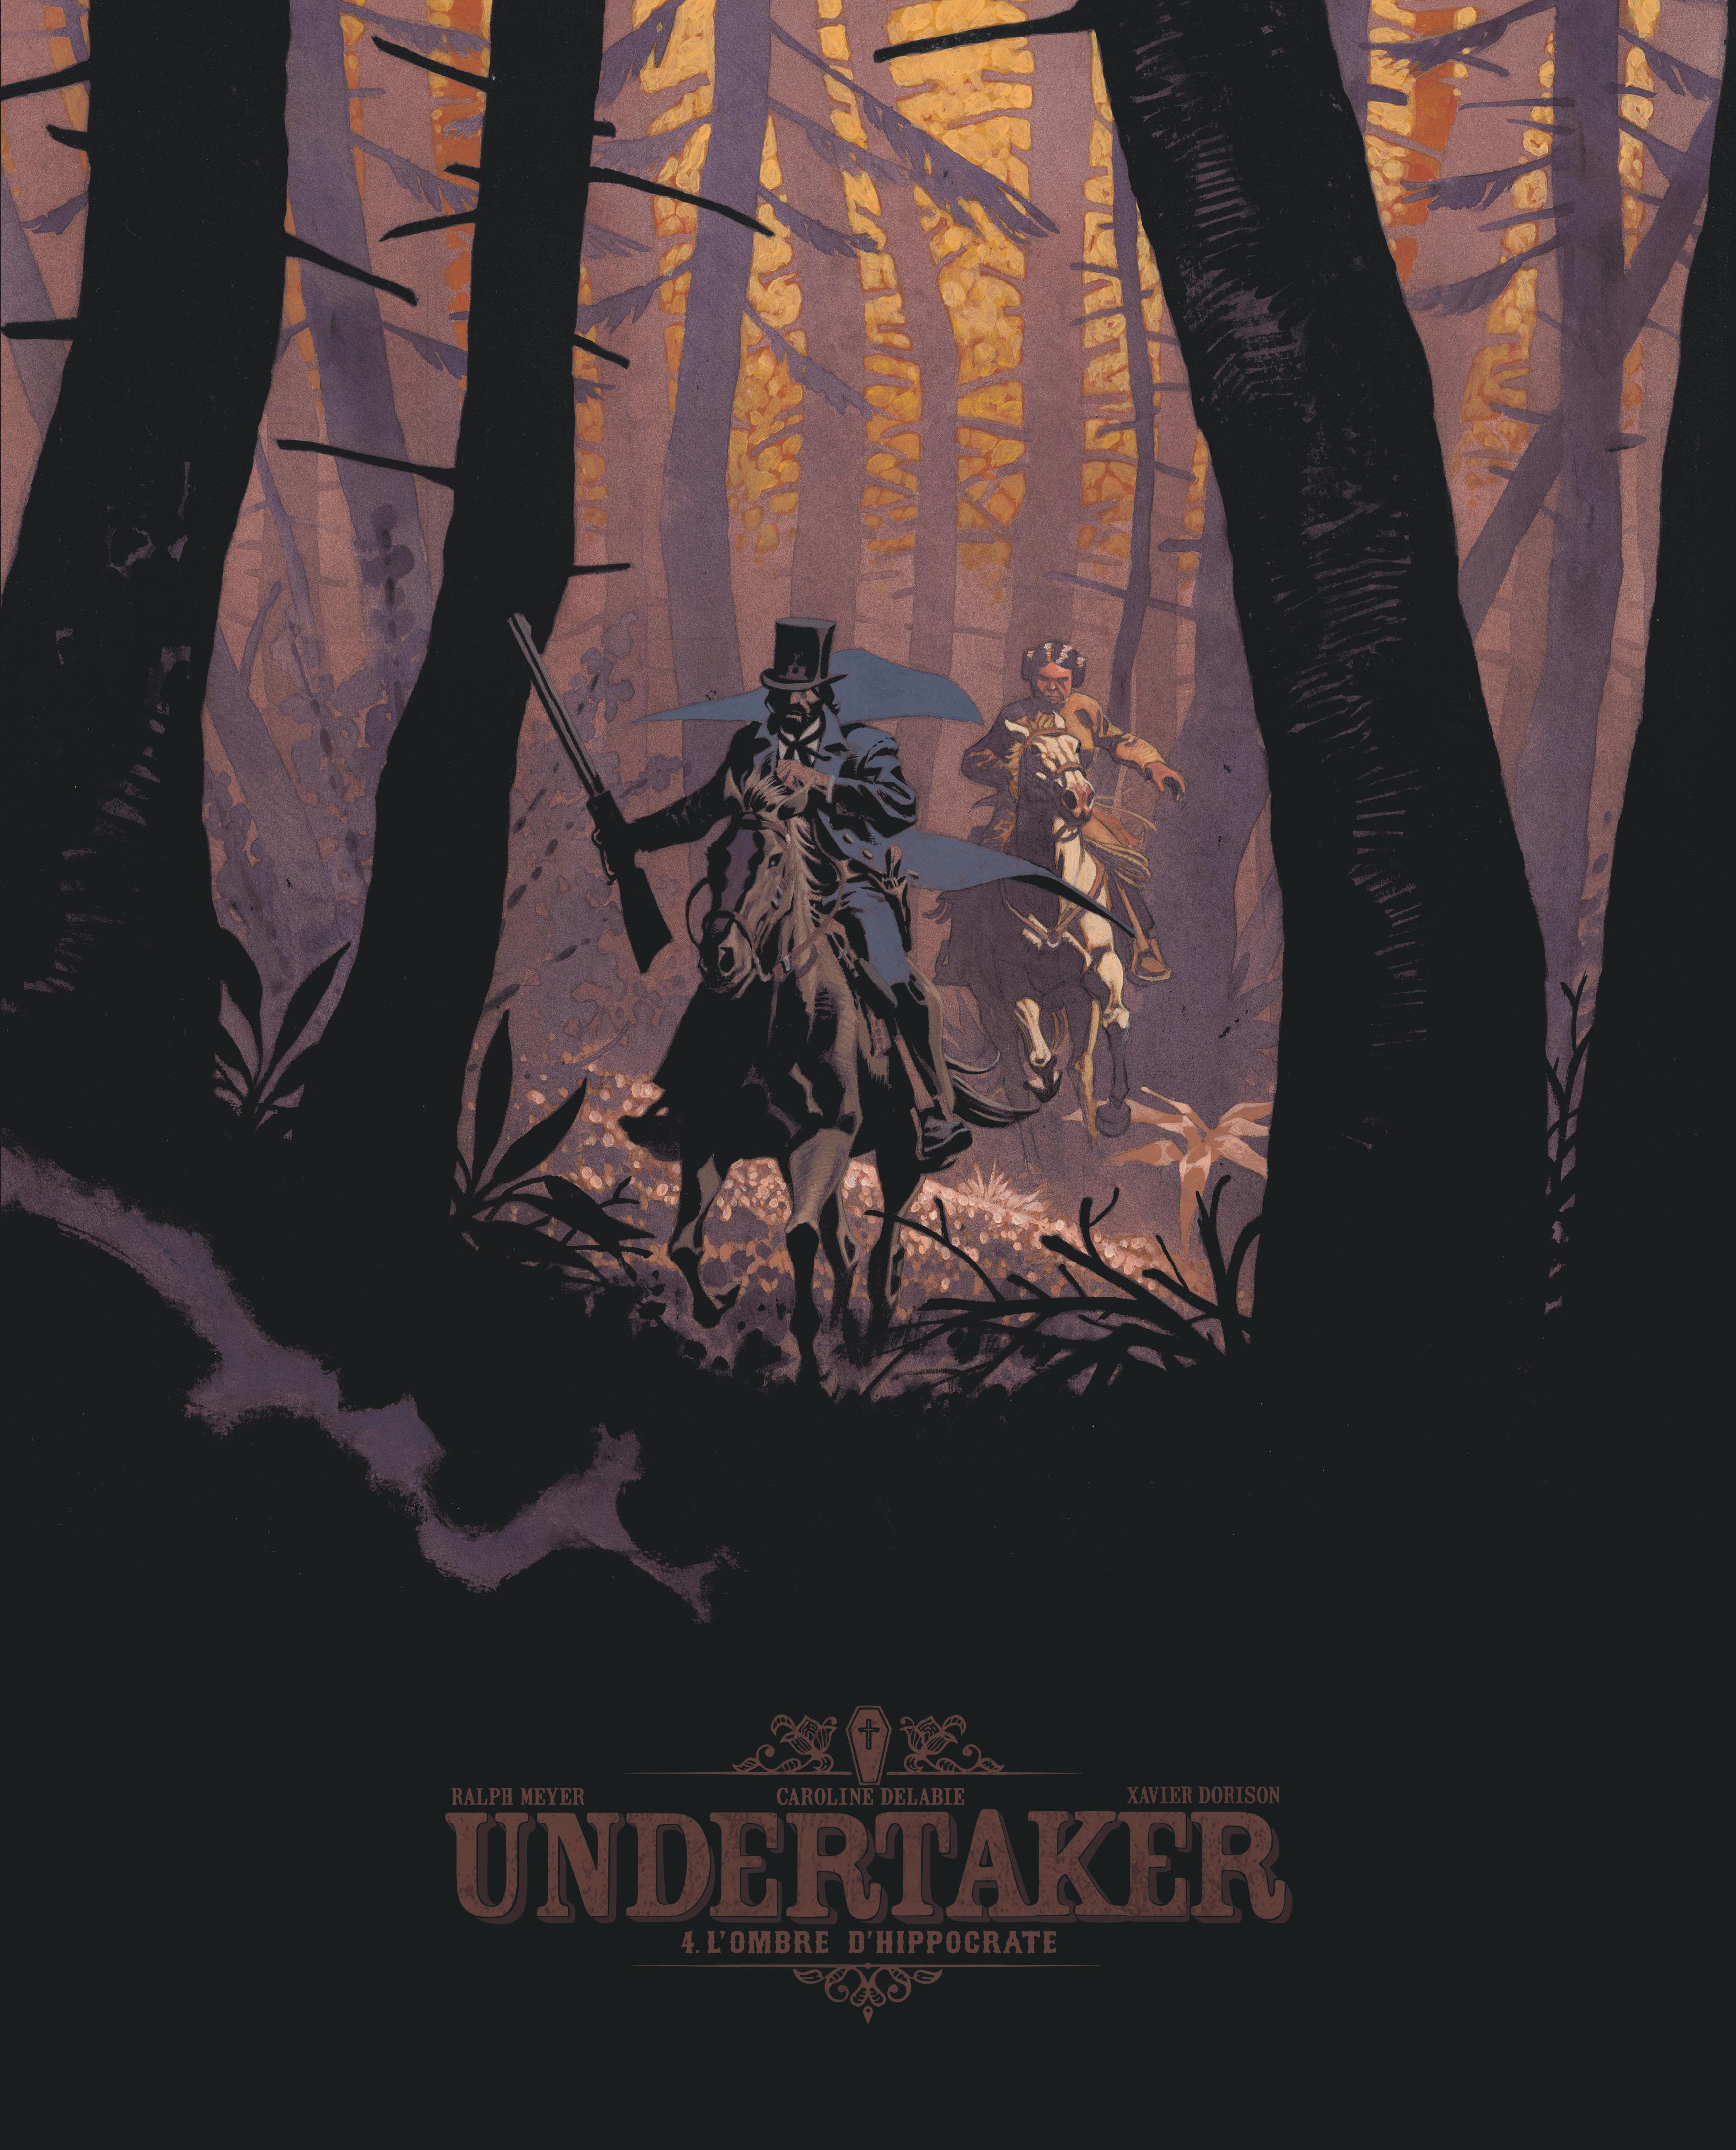 UNDERTAKER - TOME 4 - L'OMBRE D'HIPPOCRATE - EDITION BIBLIOPHILE